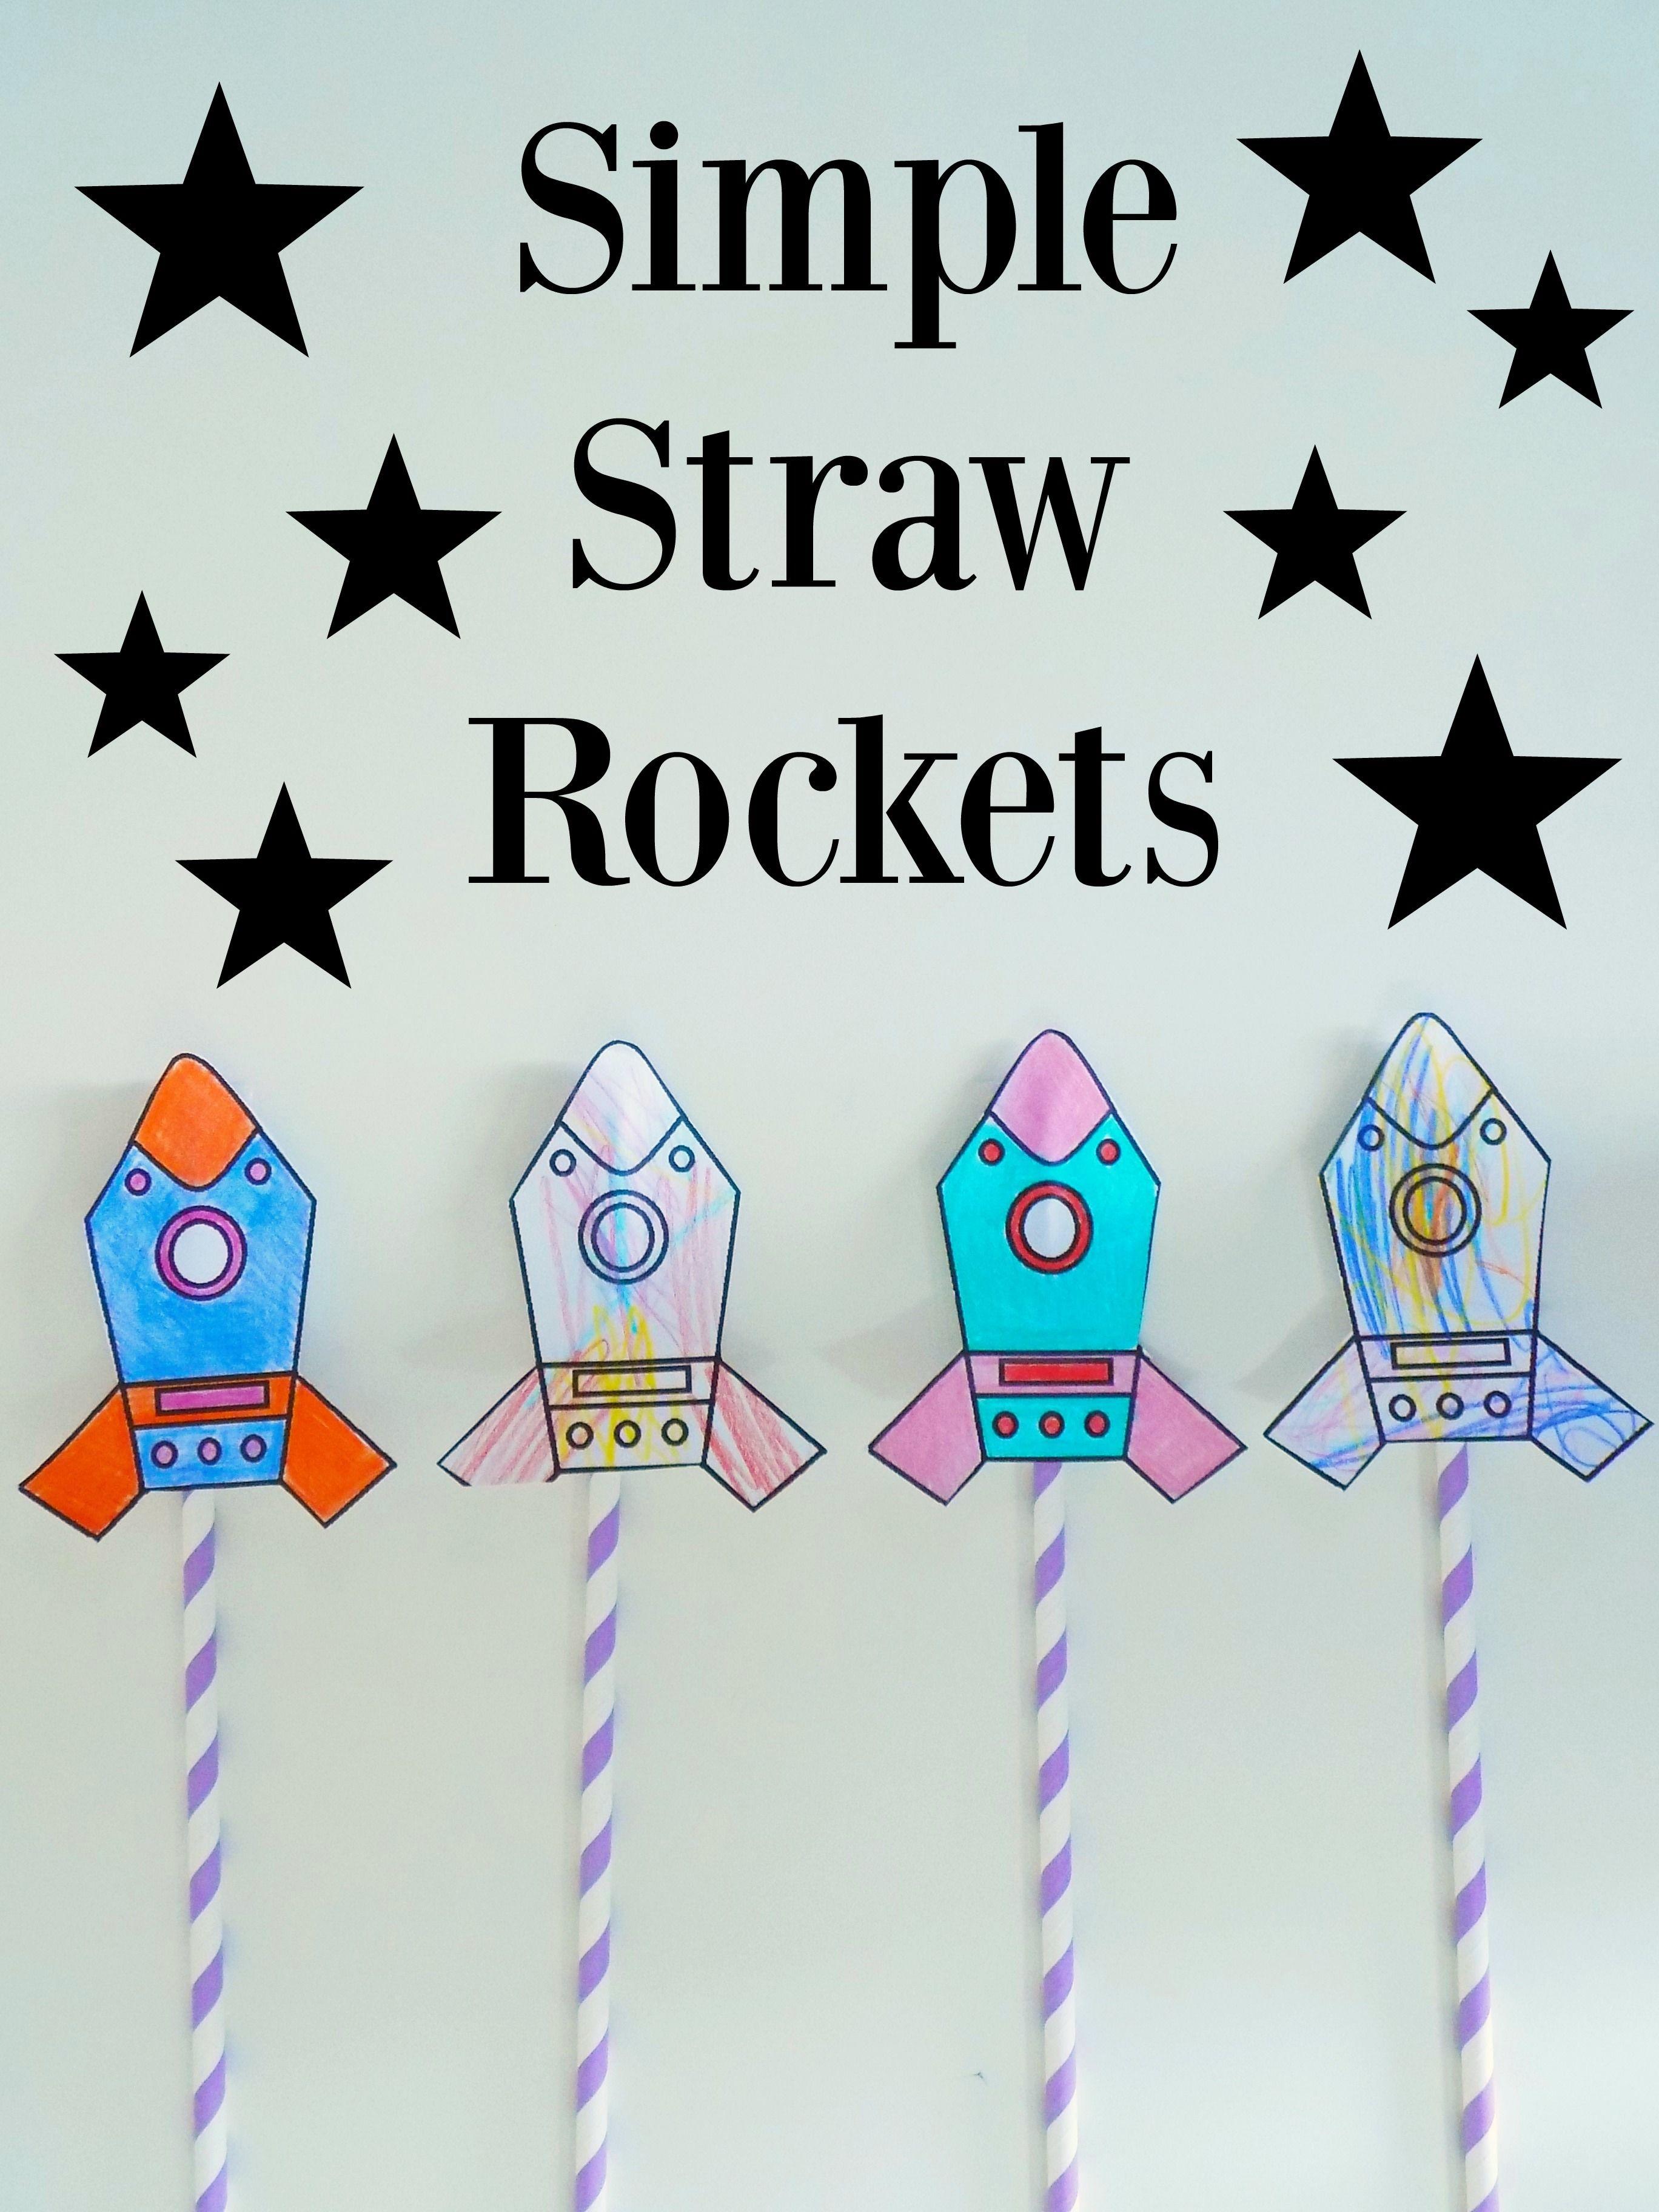 Simple Straw Rockets + Free Printable | Pre K! ✏ | Rocket Craft - Free Printable Crafts For Preschoolers